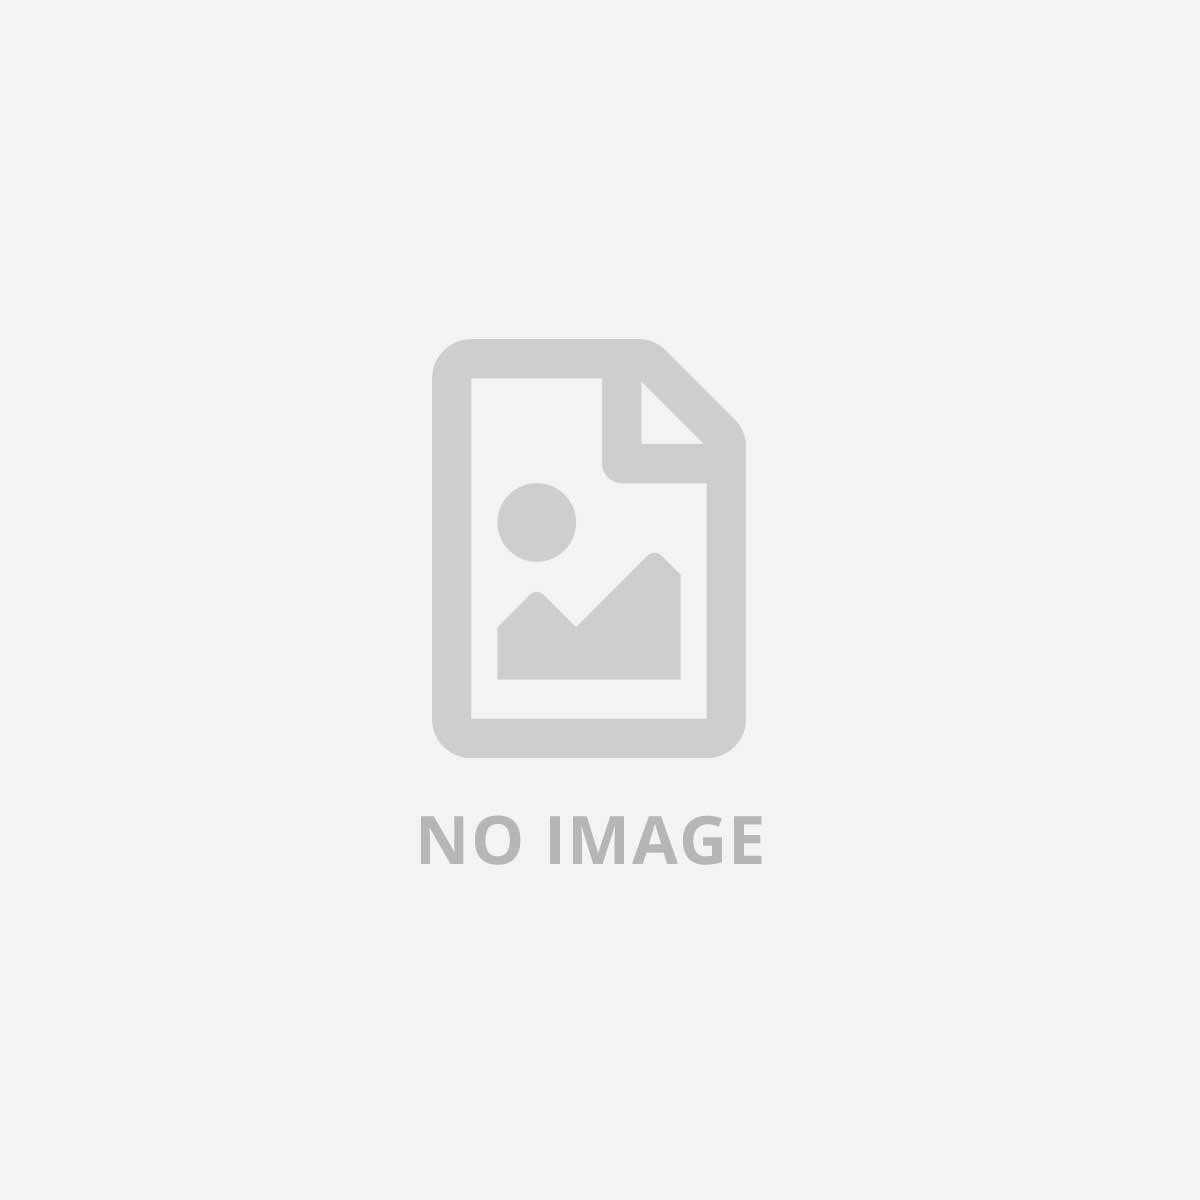 AMD RYZEN 5 2400G WRAITH STEALTH